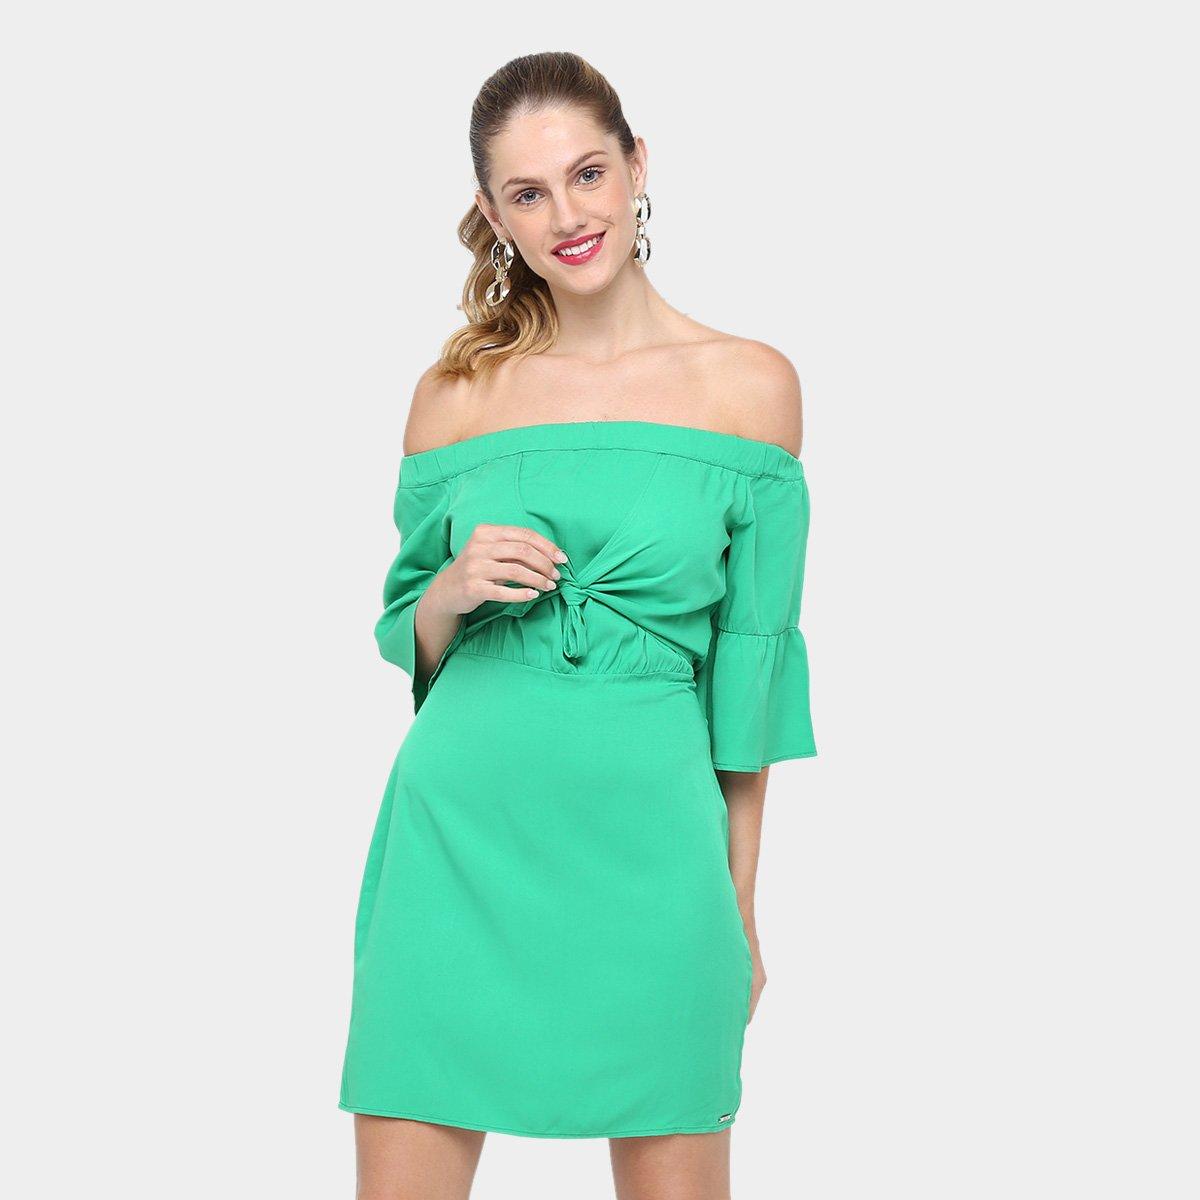 Vestido colcci curto slim verde